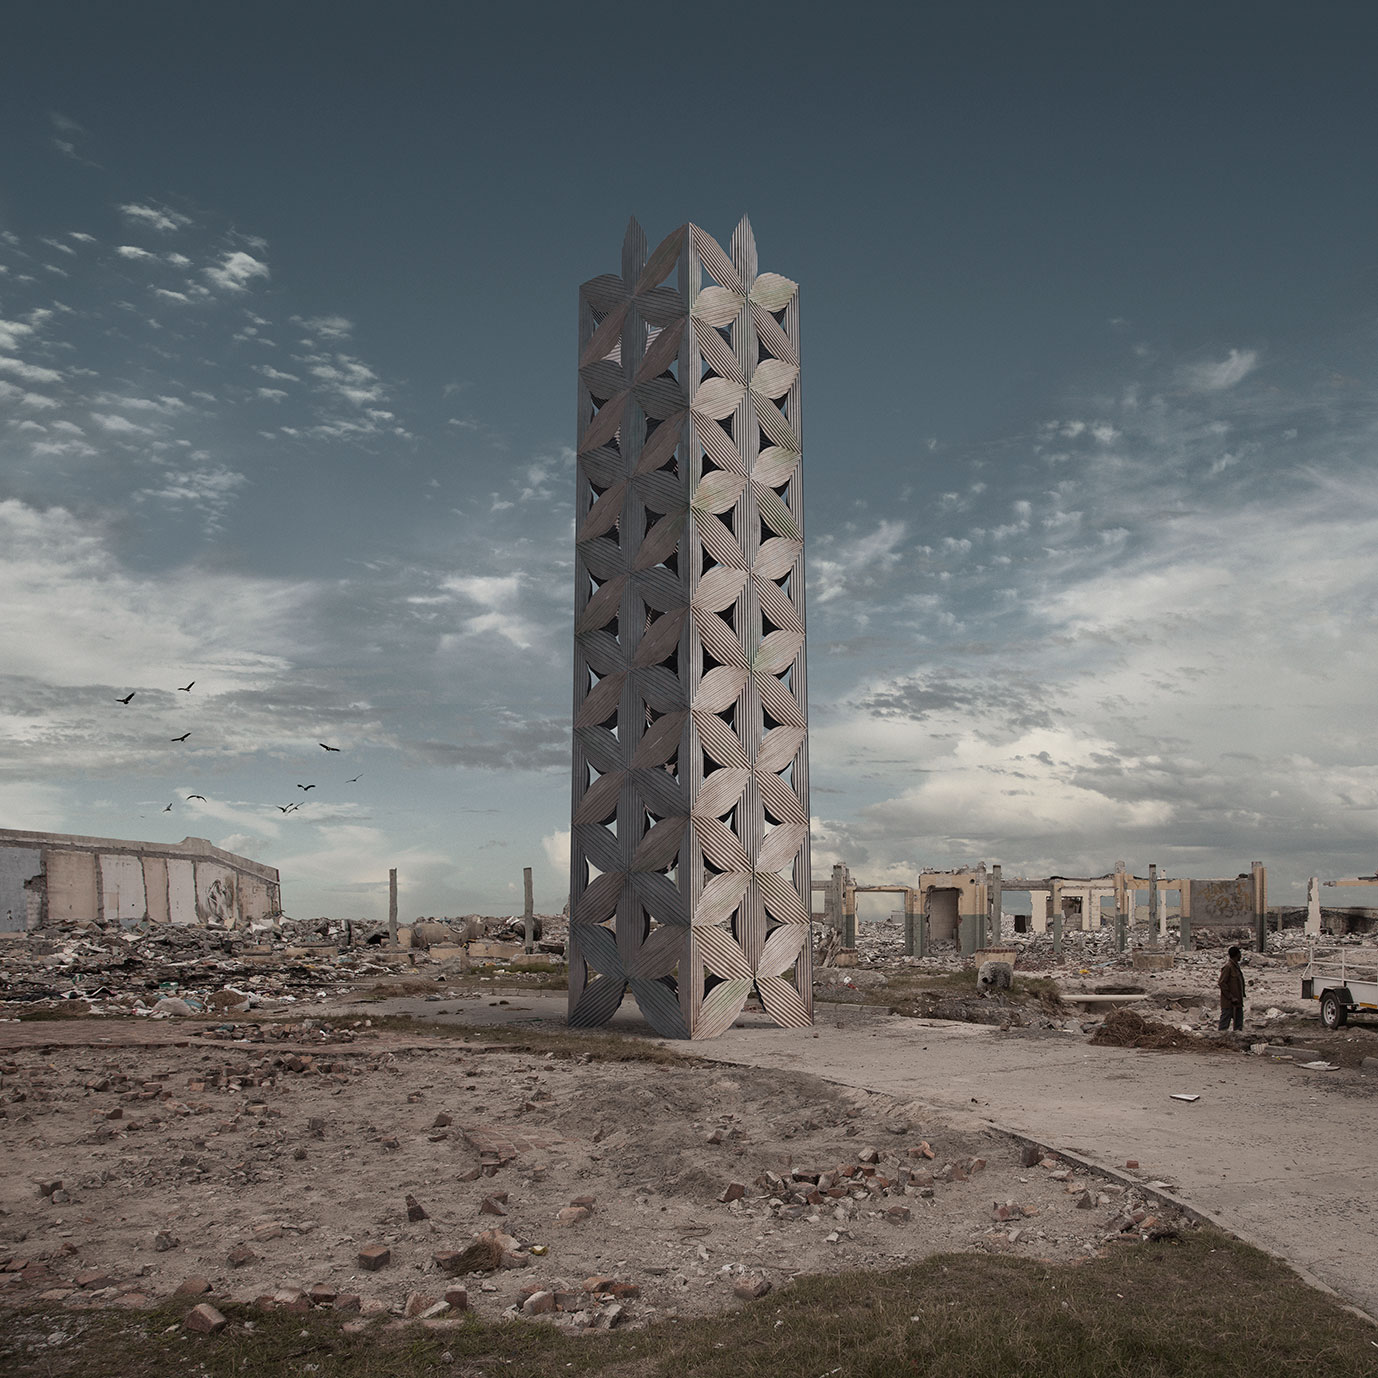 Diepsloot Dignity Tower